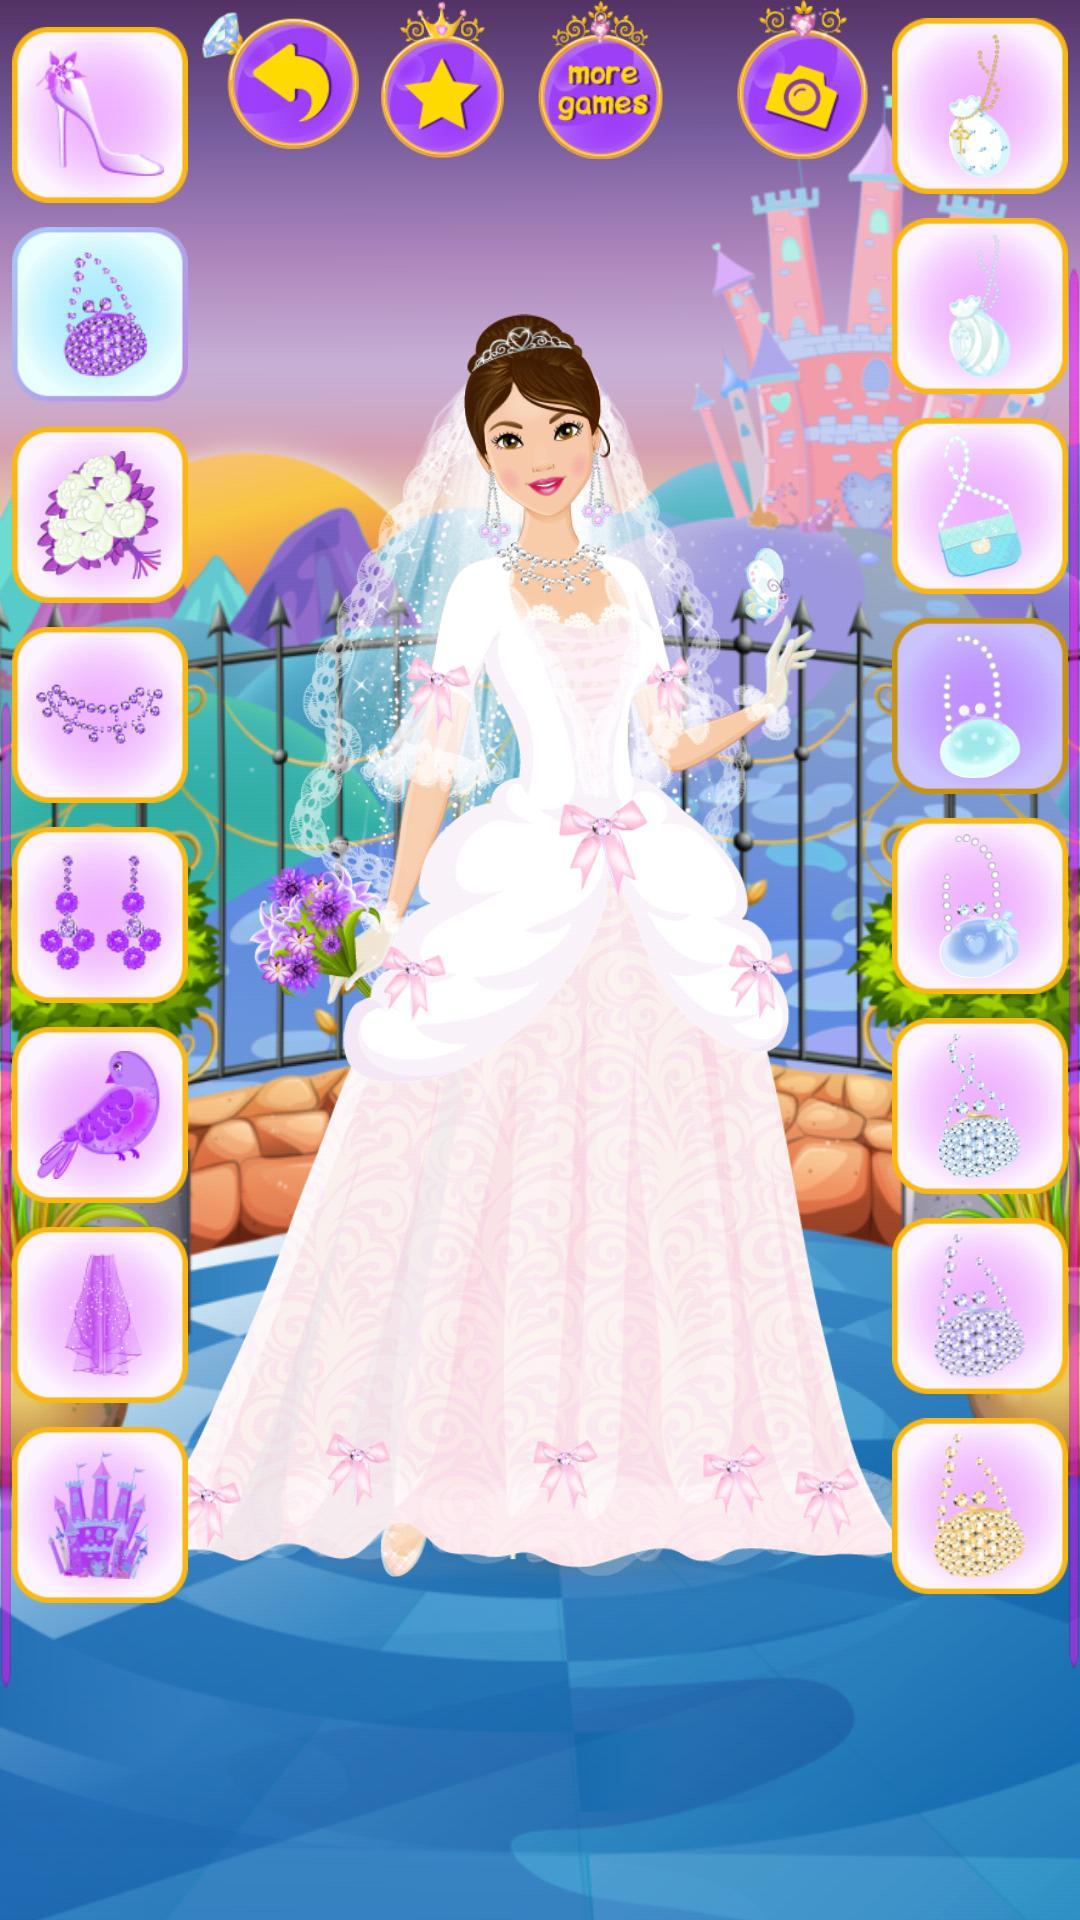 Wedding Dress Up - Bride makeover for Android - APK Download